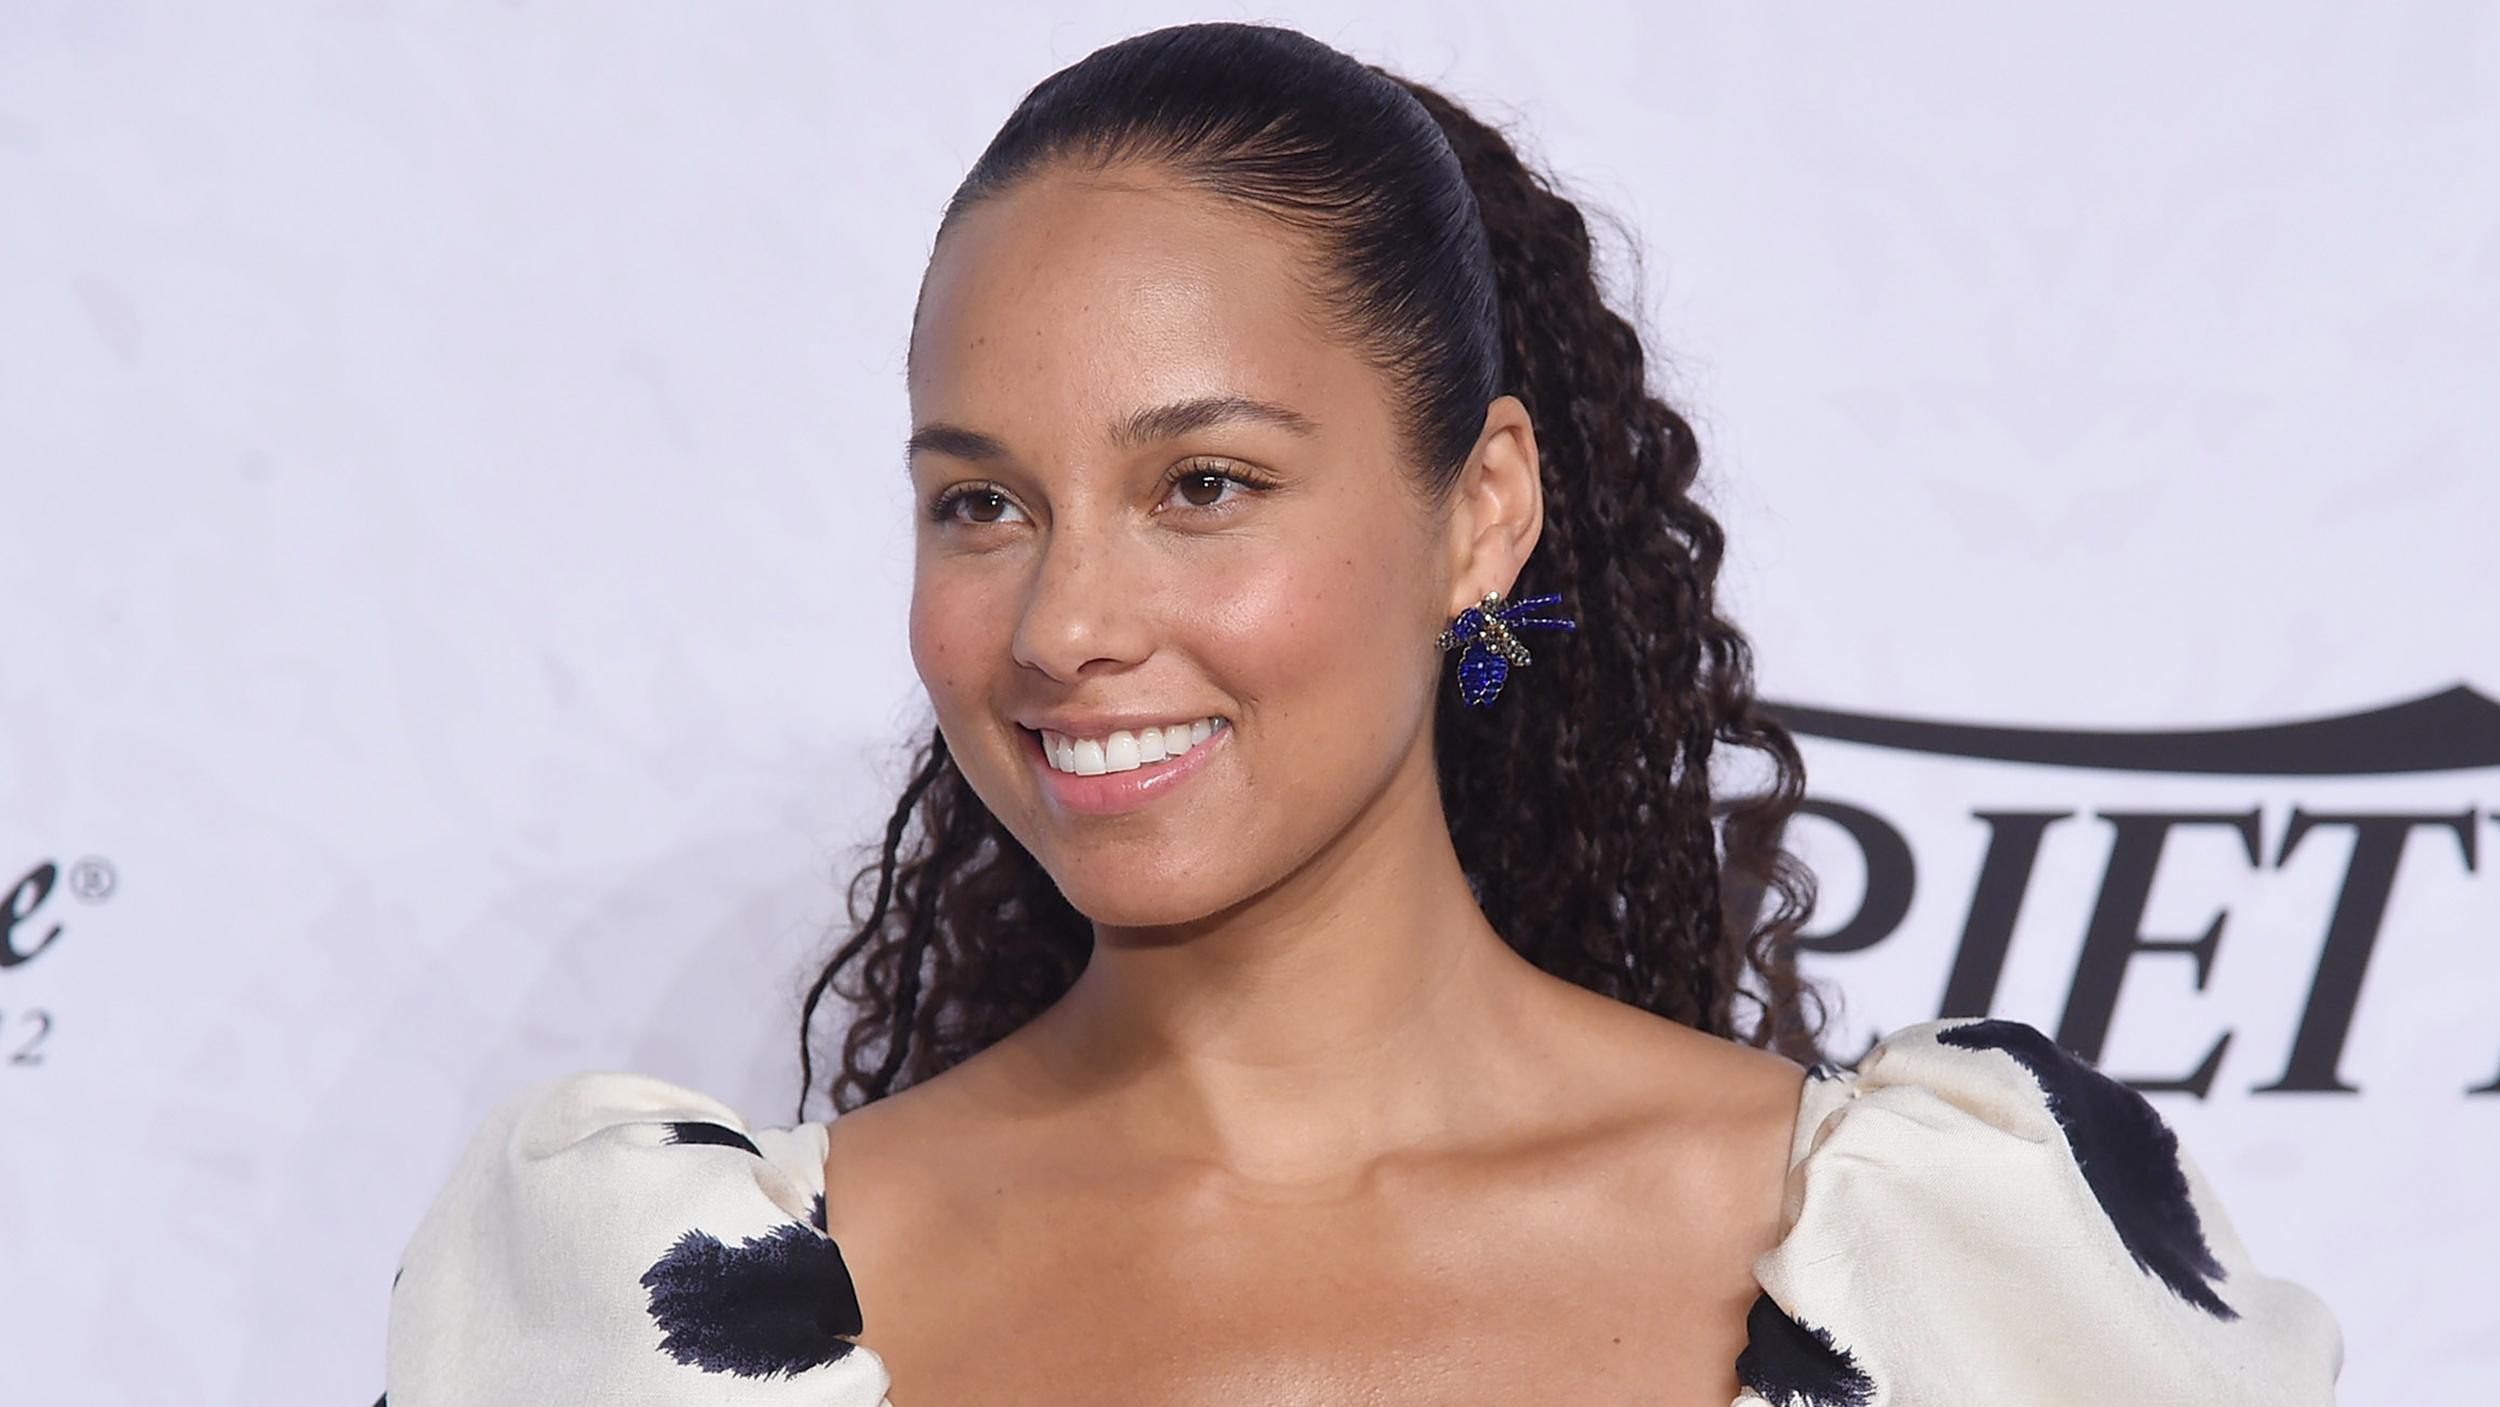 Alicia Keys Hair Is Now A Sleek Bob Cut